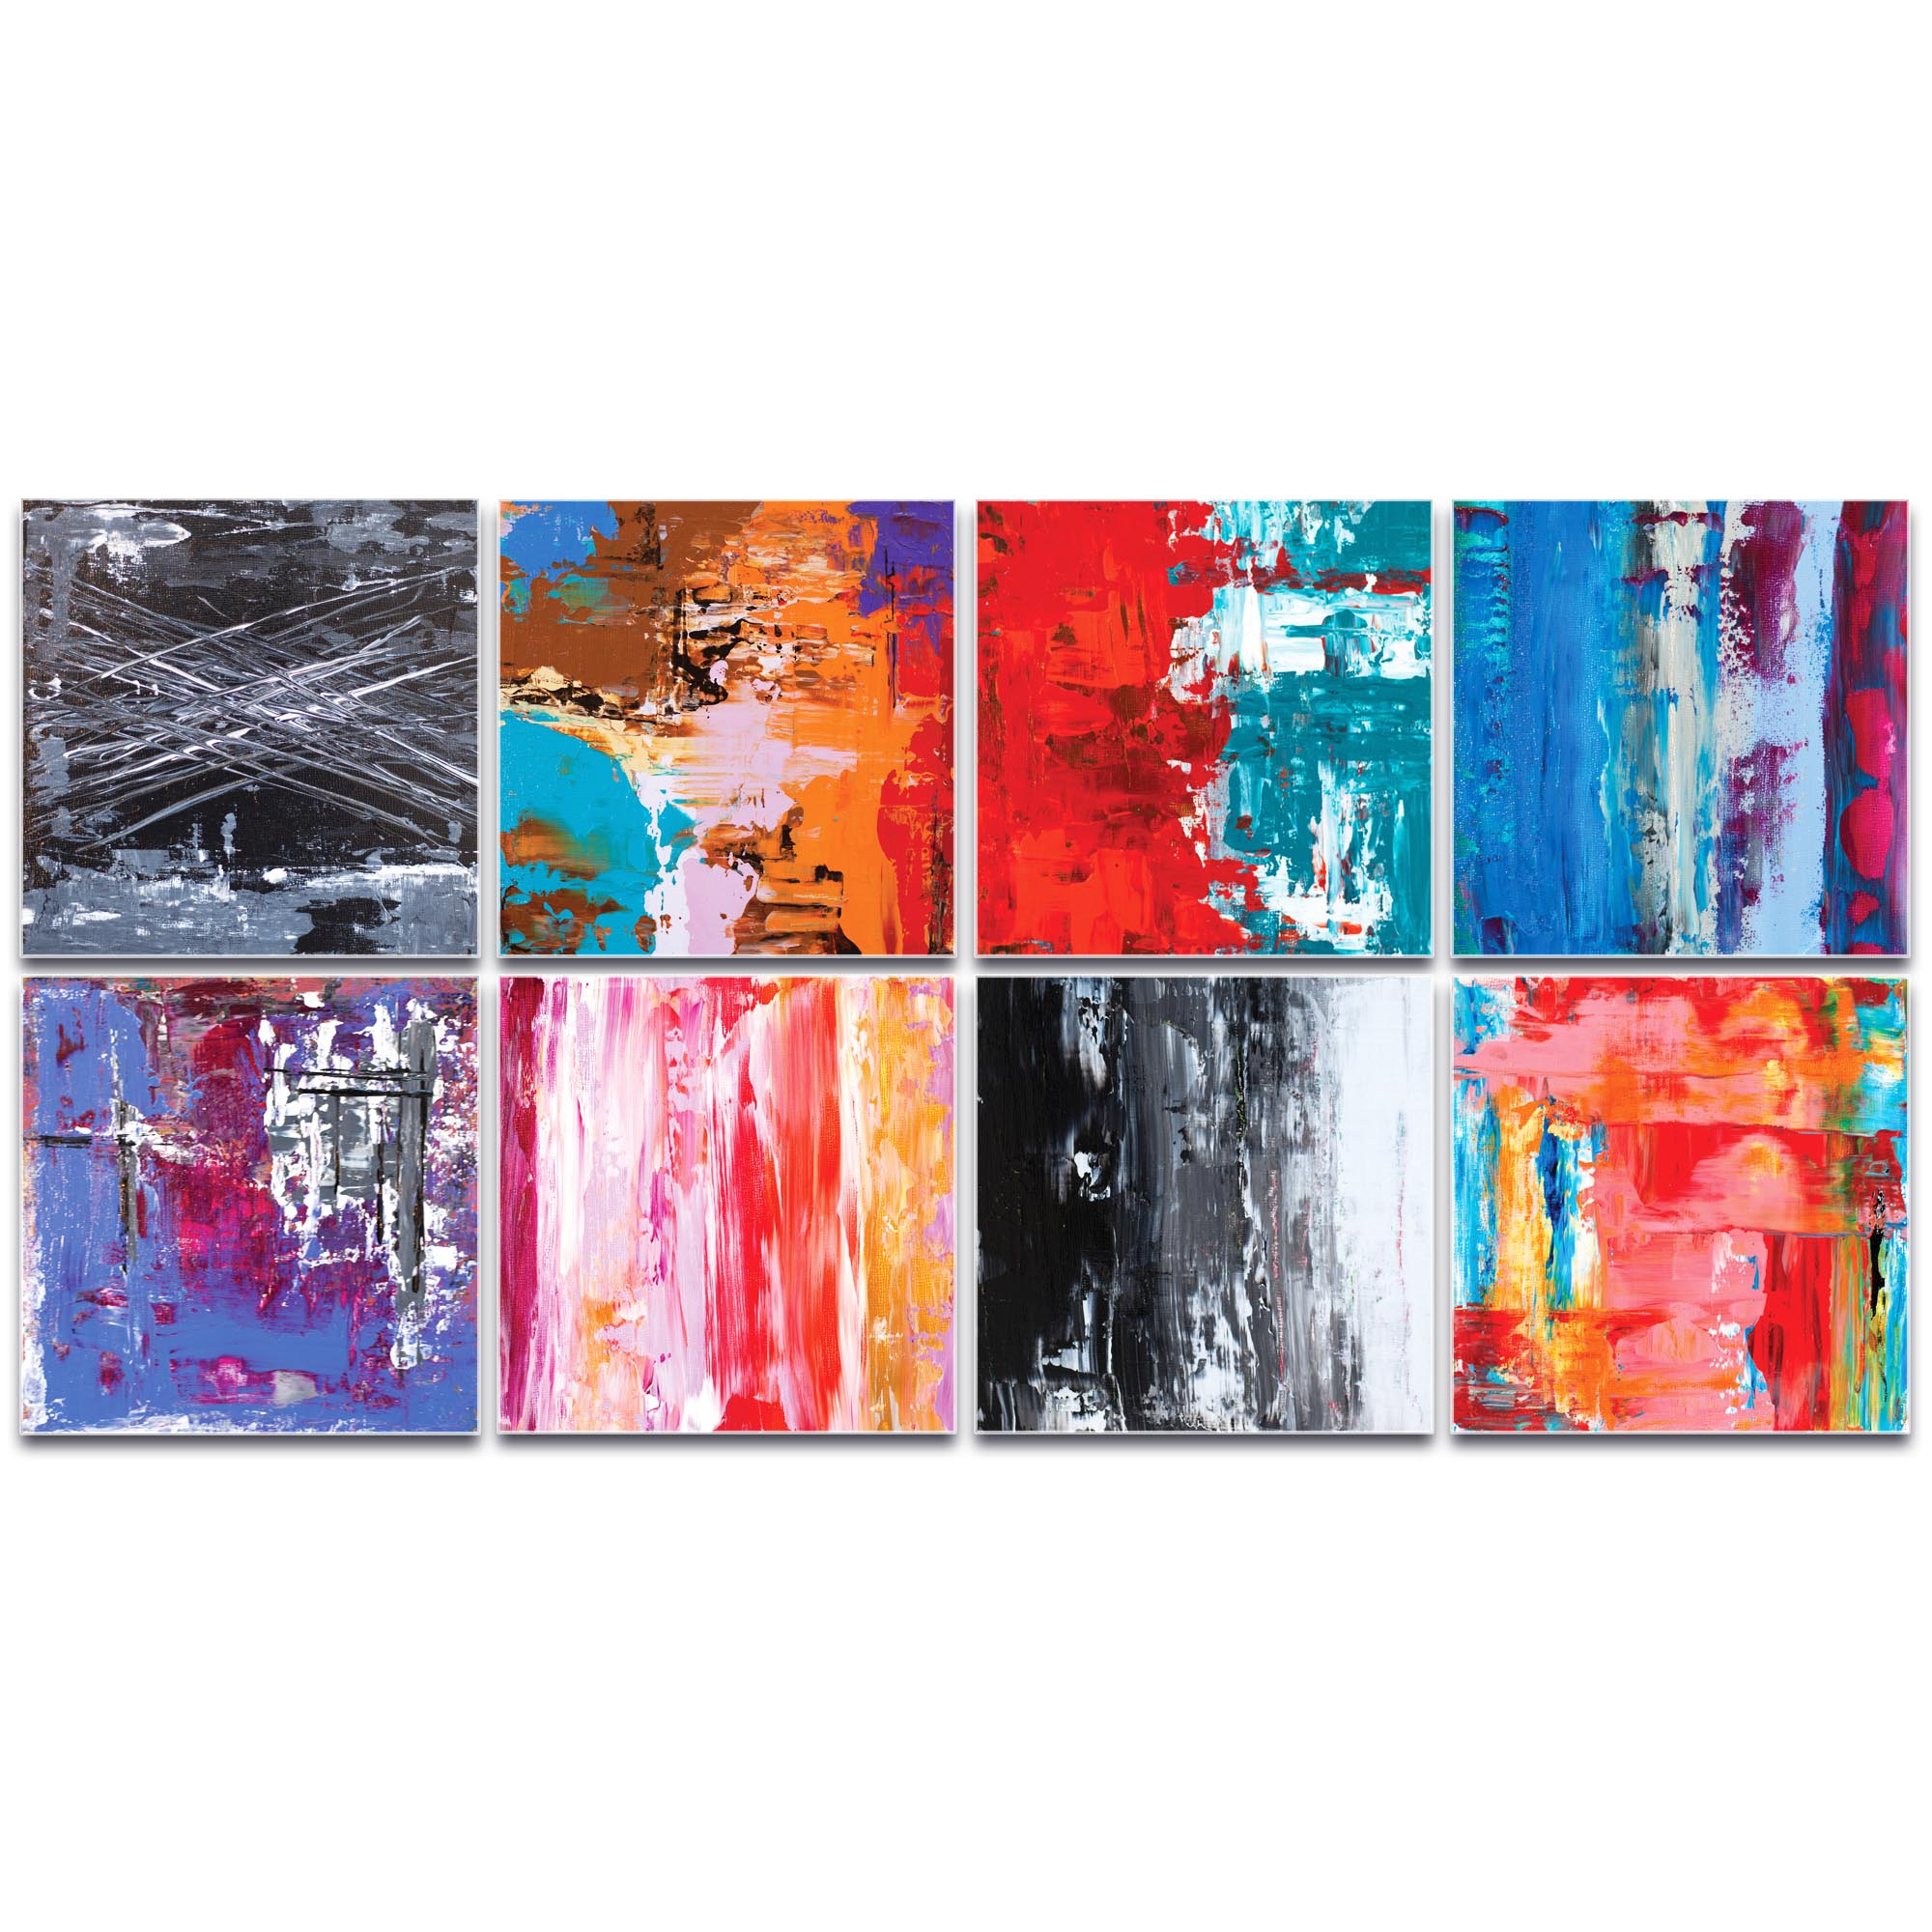 Abstract Wall Art 'Urban Windows' - Urban Decor on Metal or Plexiglass - Image 2